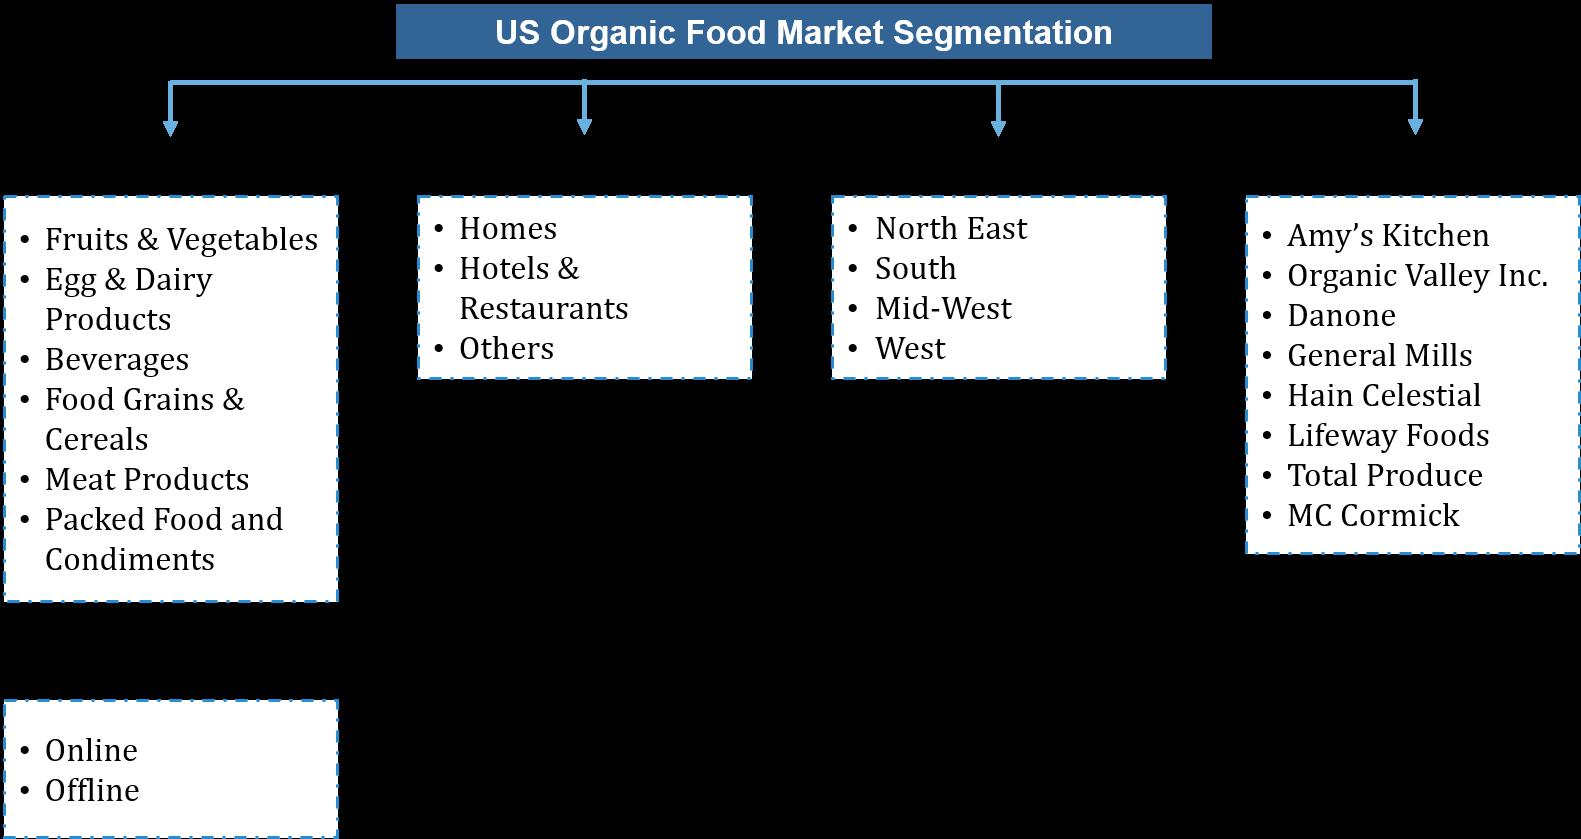 USA Organic Food Market Segmentation